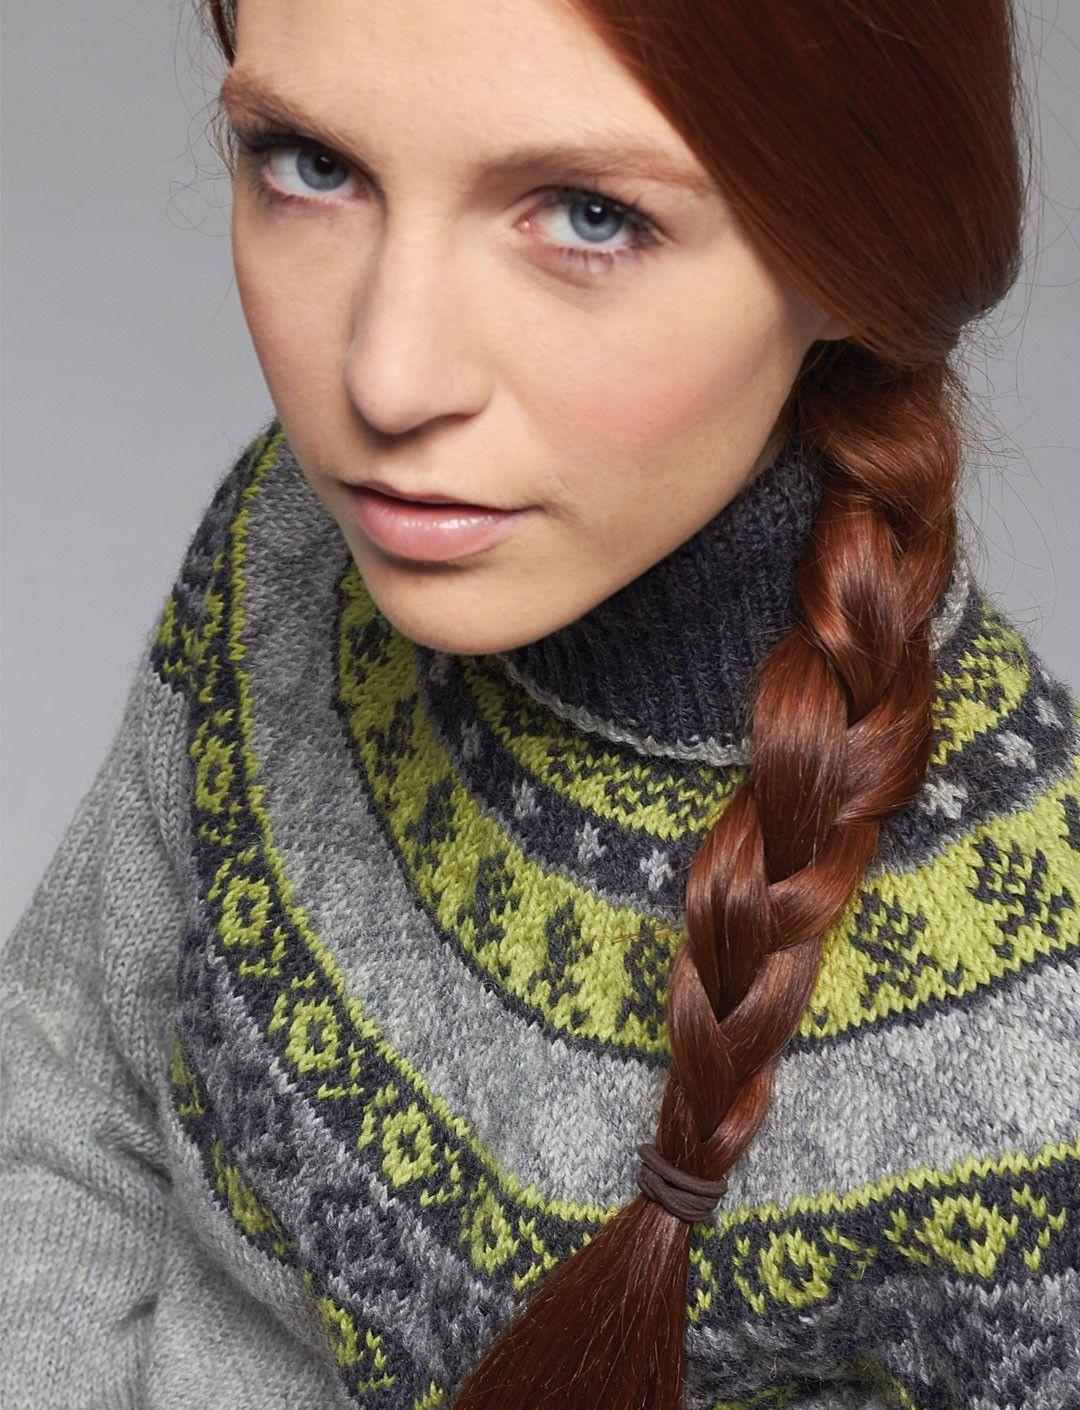 Yarnspirations.com - Patons Woman's Fair Isle Yoke Sweater ...